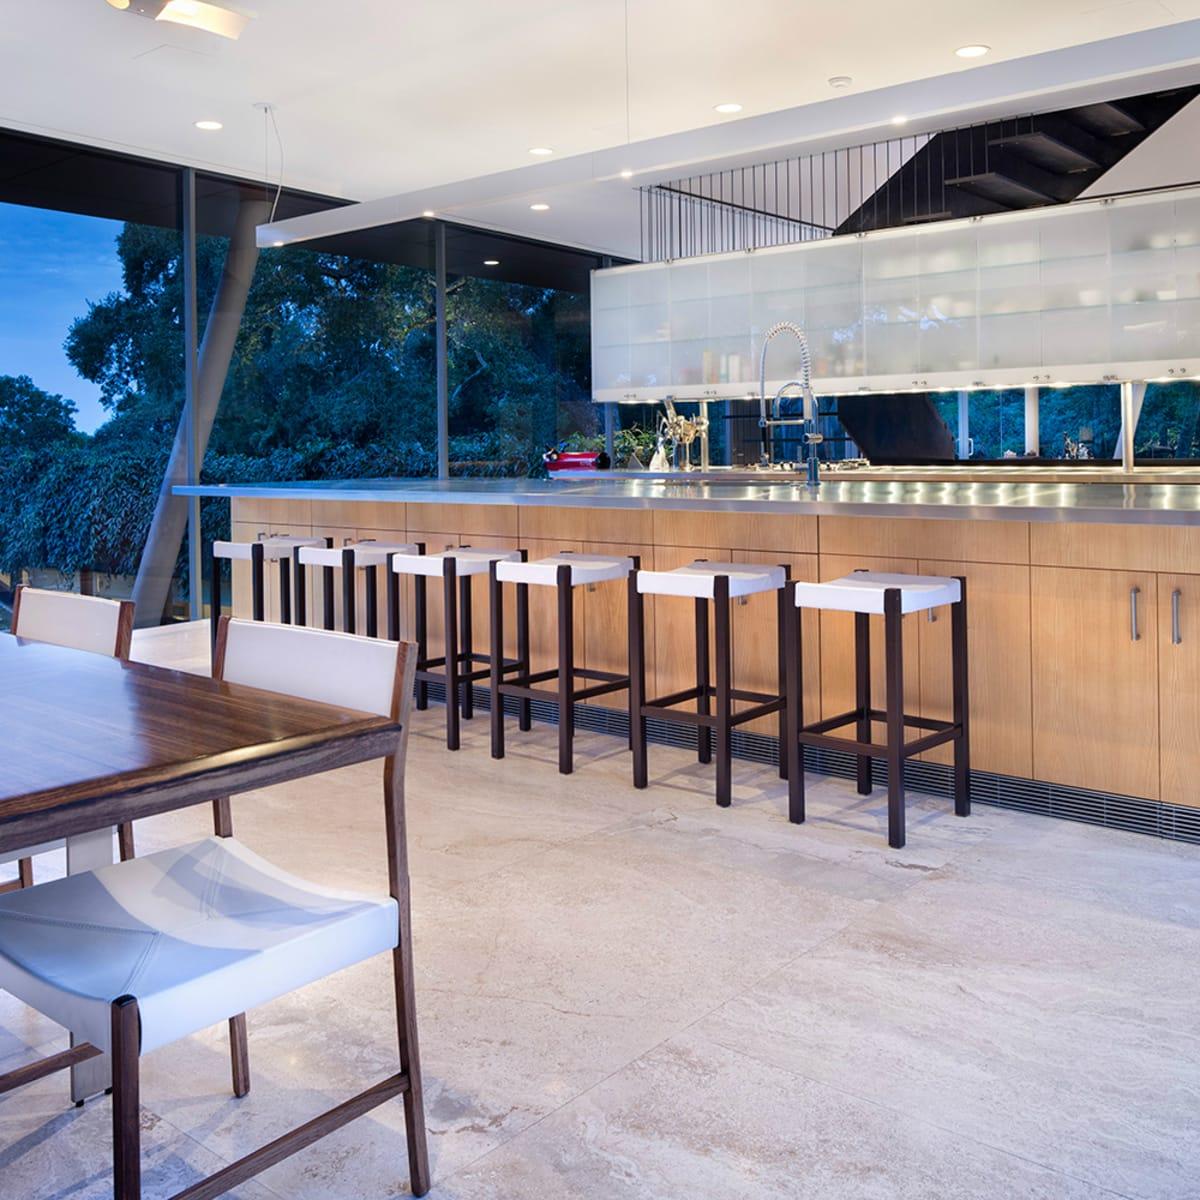 Austin home Floating Box House 900 Live Oak Circle West Lake Hills 78746 April 2016 upstairs kitchen